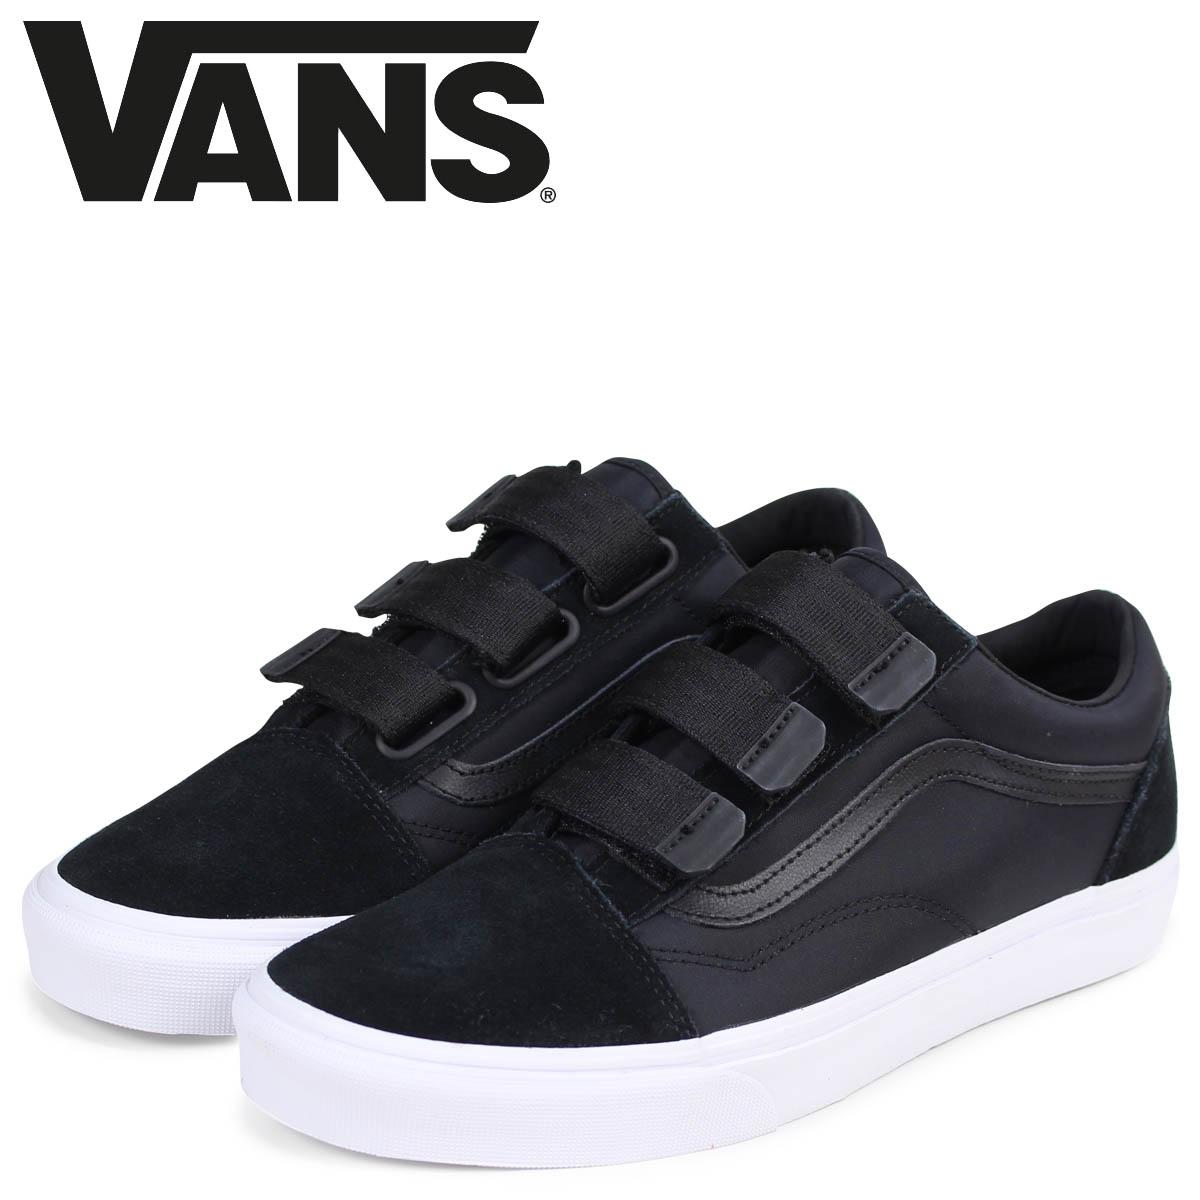 3815a0cd156 Sugar Online Shop  Vans old school sneakers men VANS station wagons ...